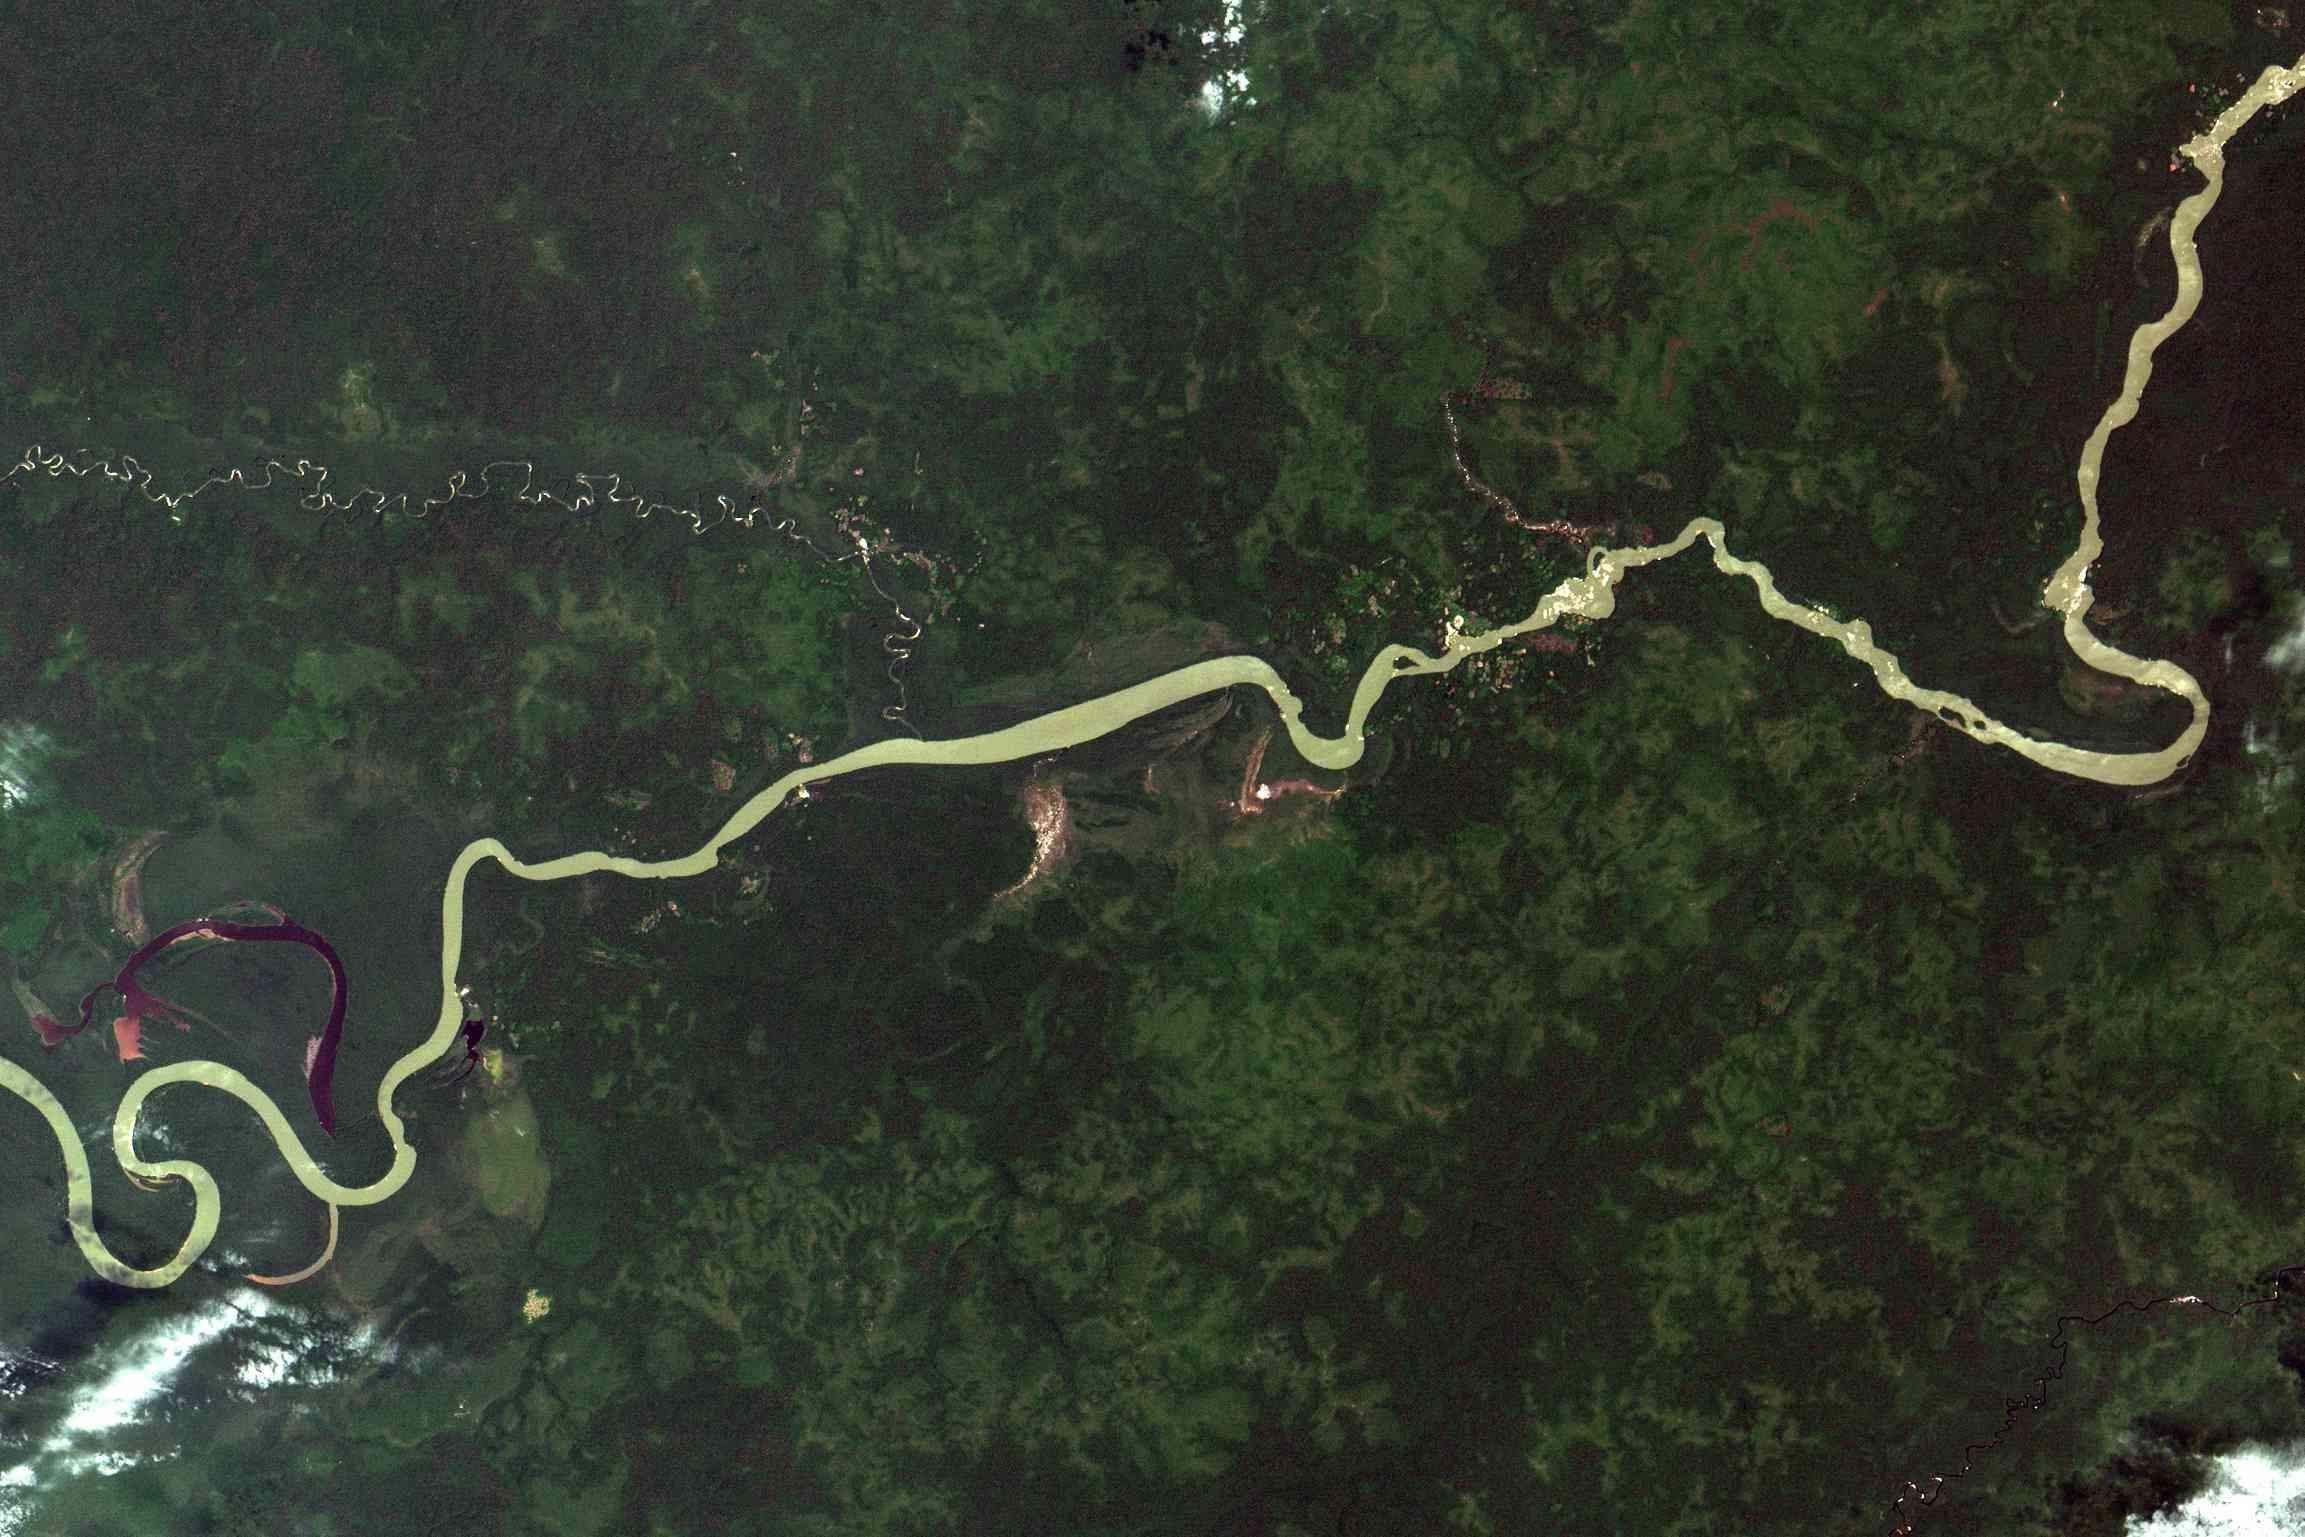 Satellite view of Amazon River